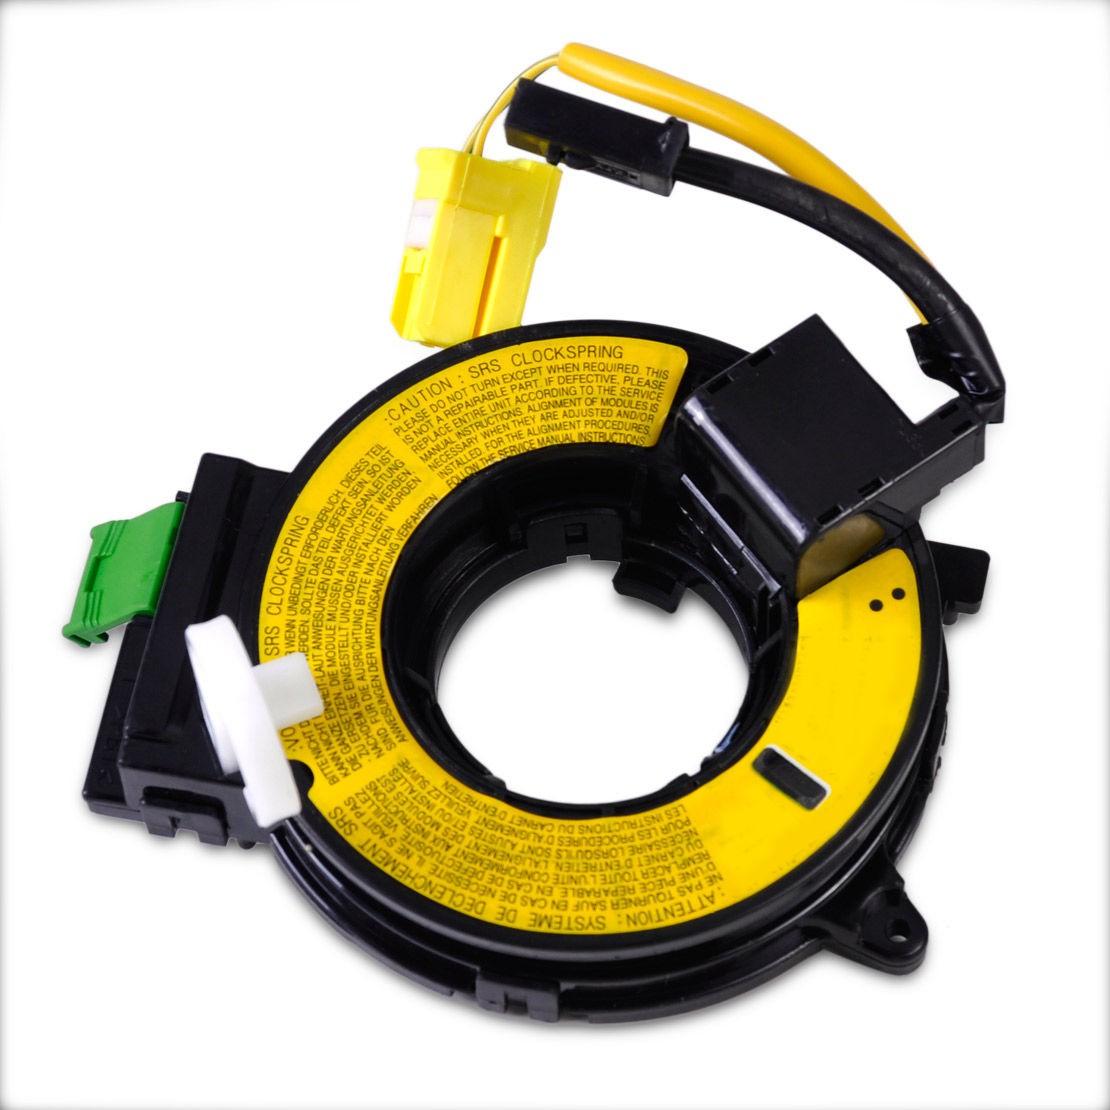 Cinta Airbag Hard Disc L200 Triton Controle de Som Piloto Aut.  8619a017